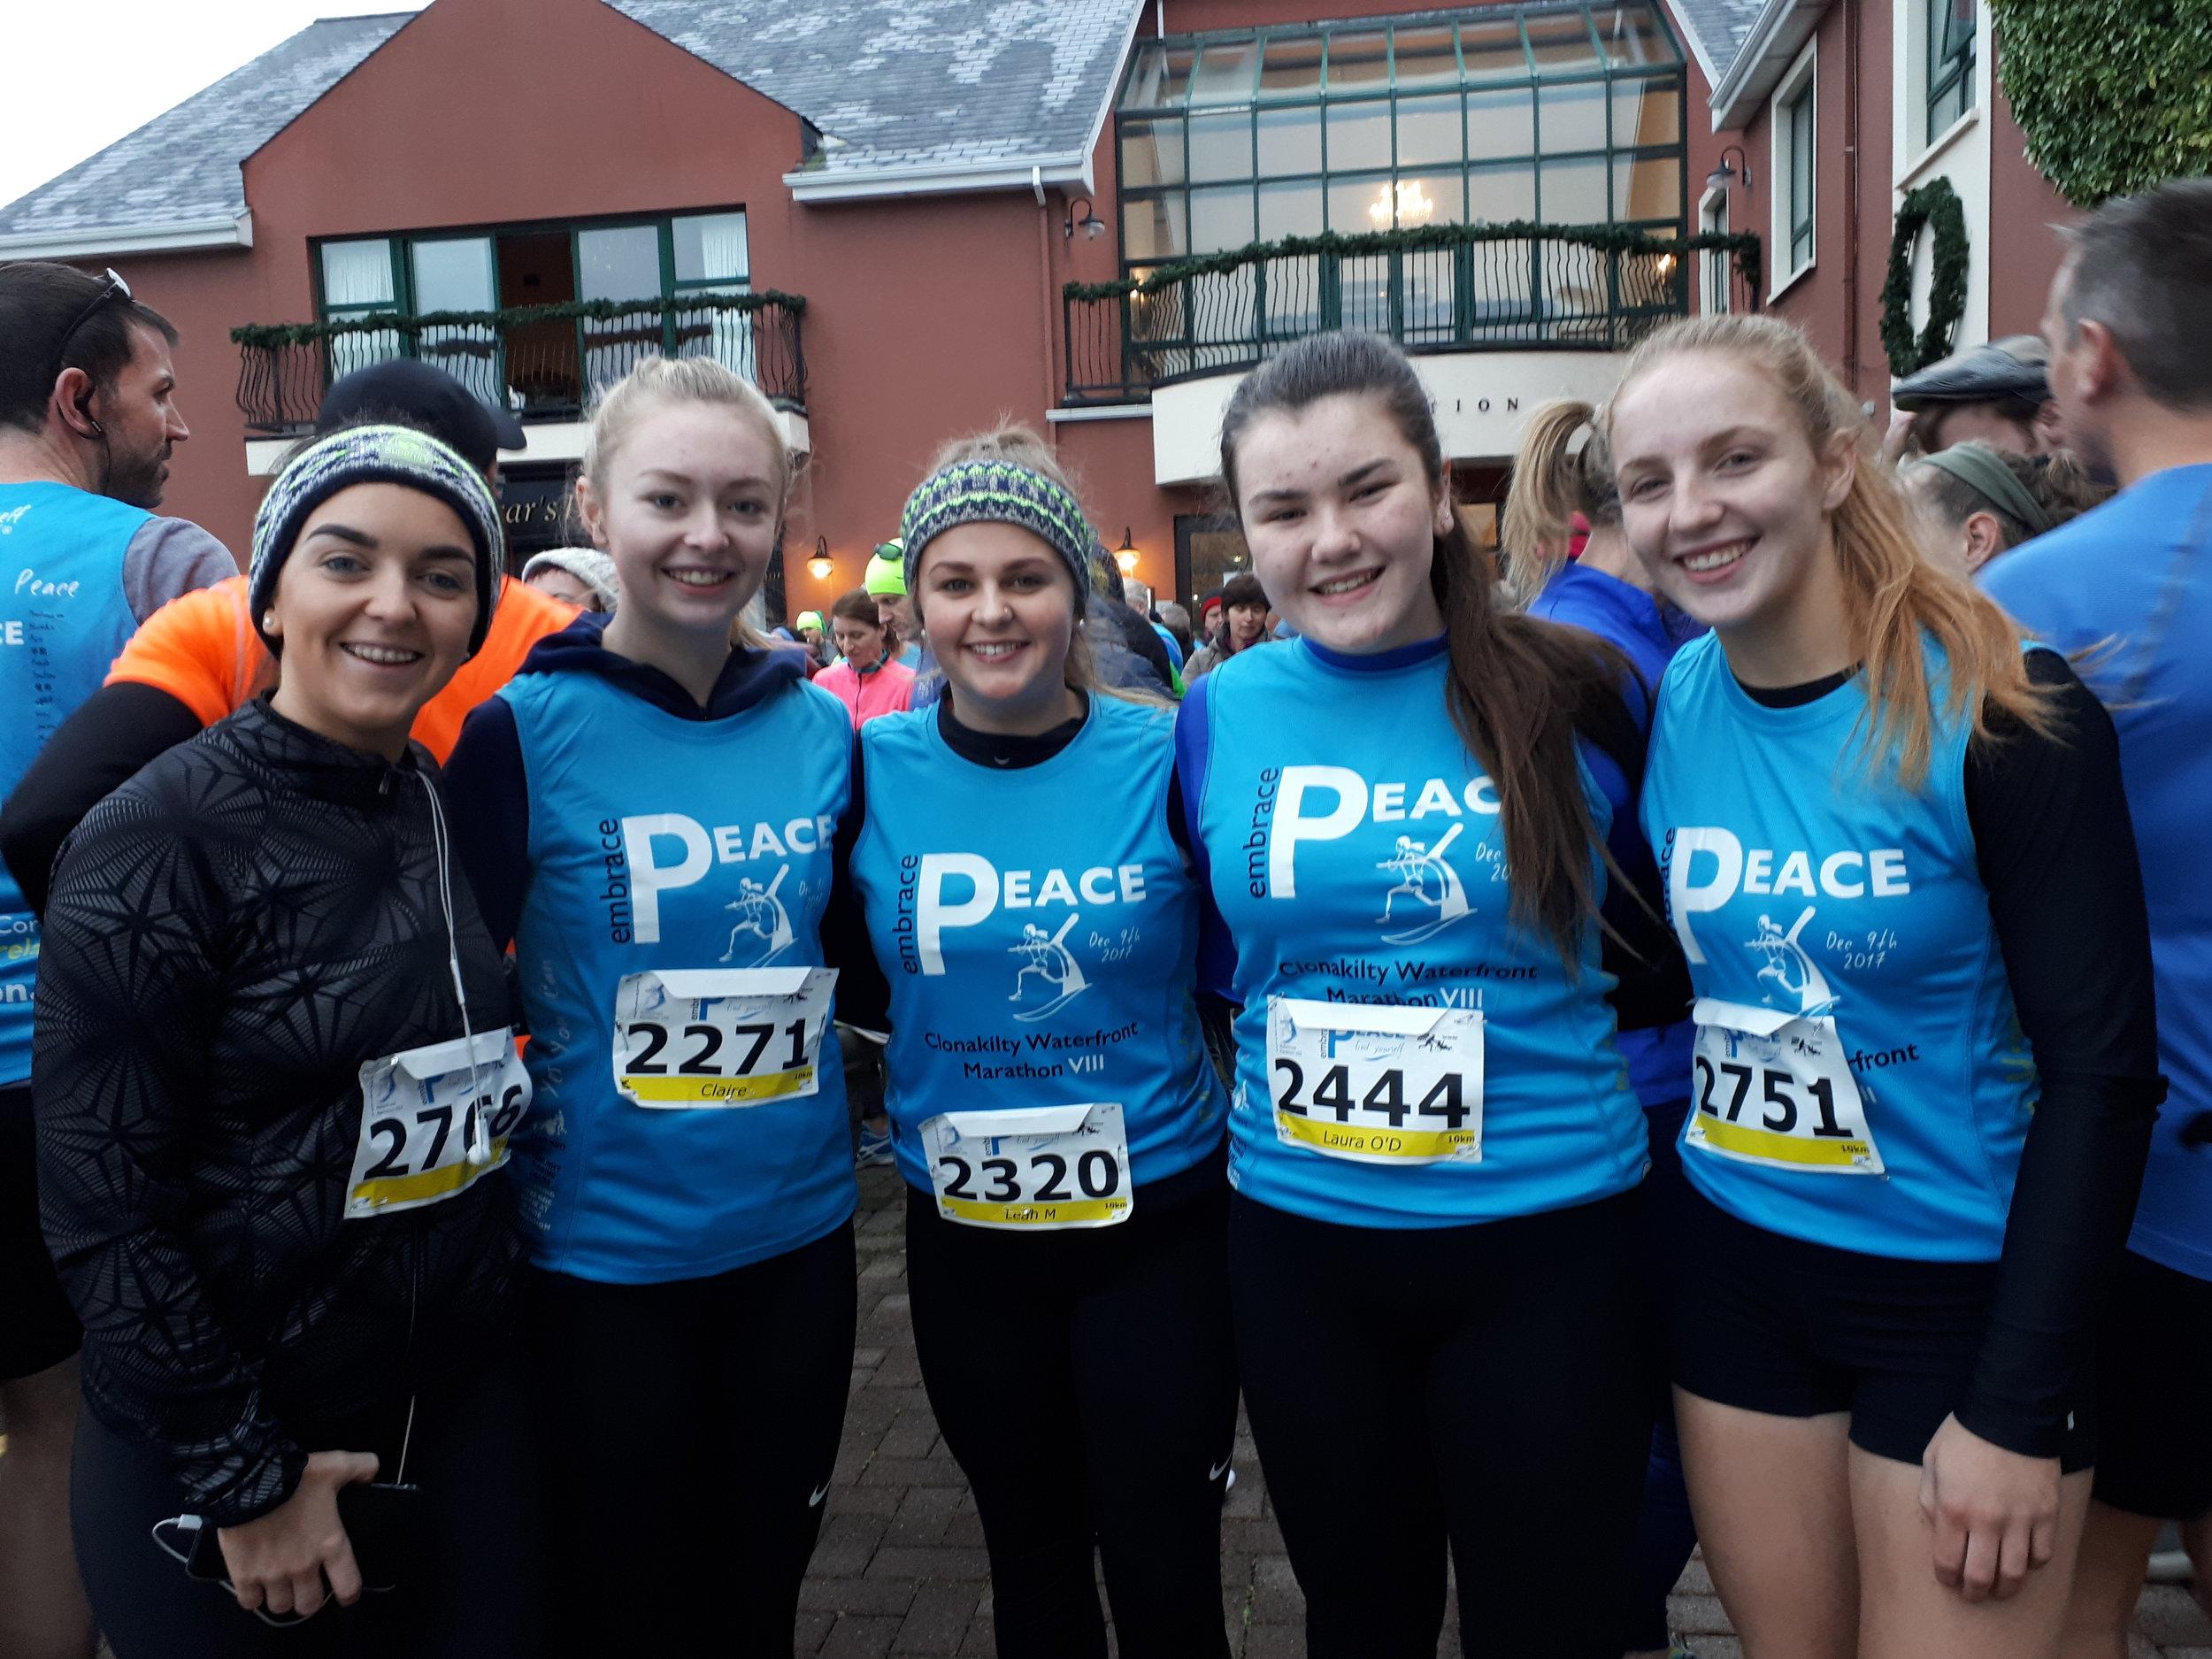 Lynn Knowles, Eve Crowley, Leah McAree, Laura O'Donovan and Meabh O'Donovan